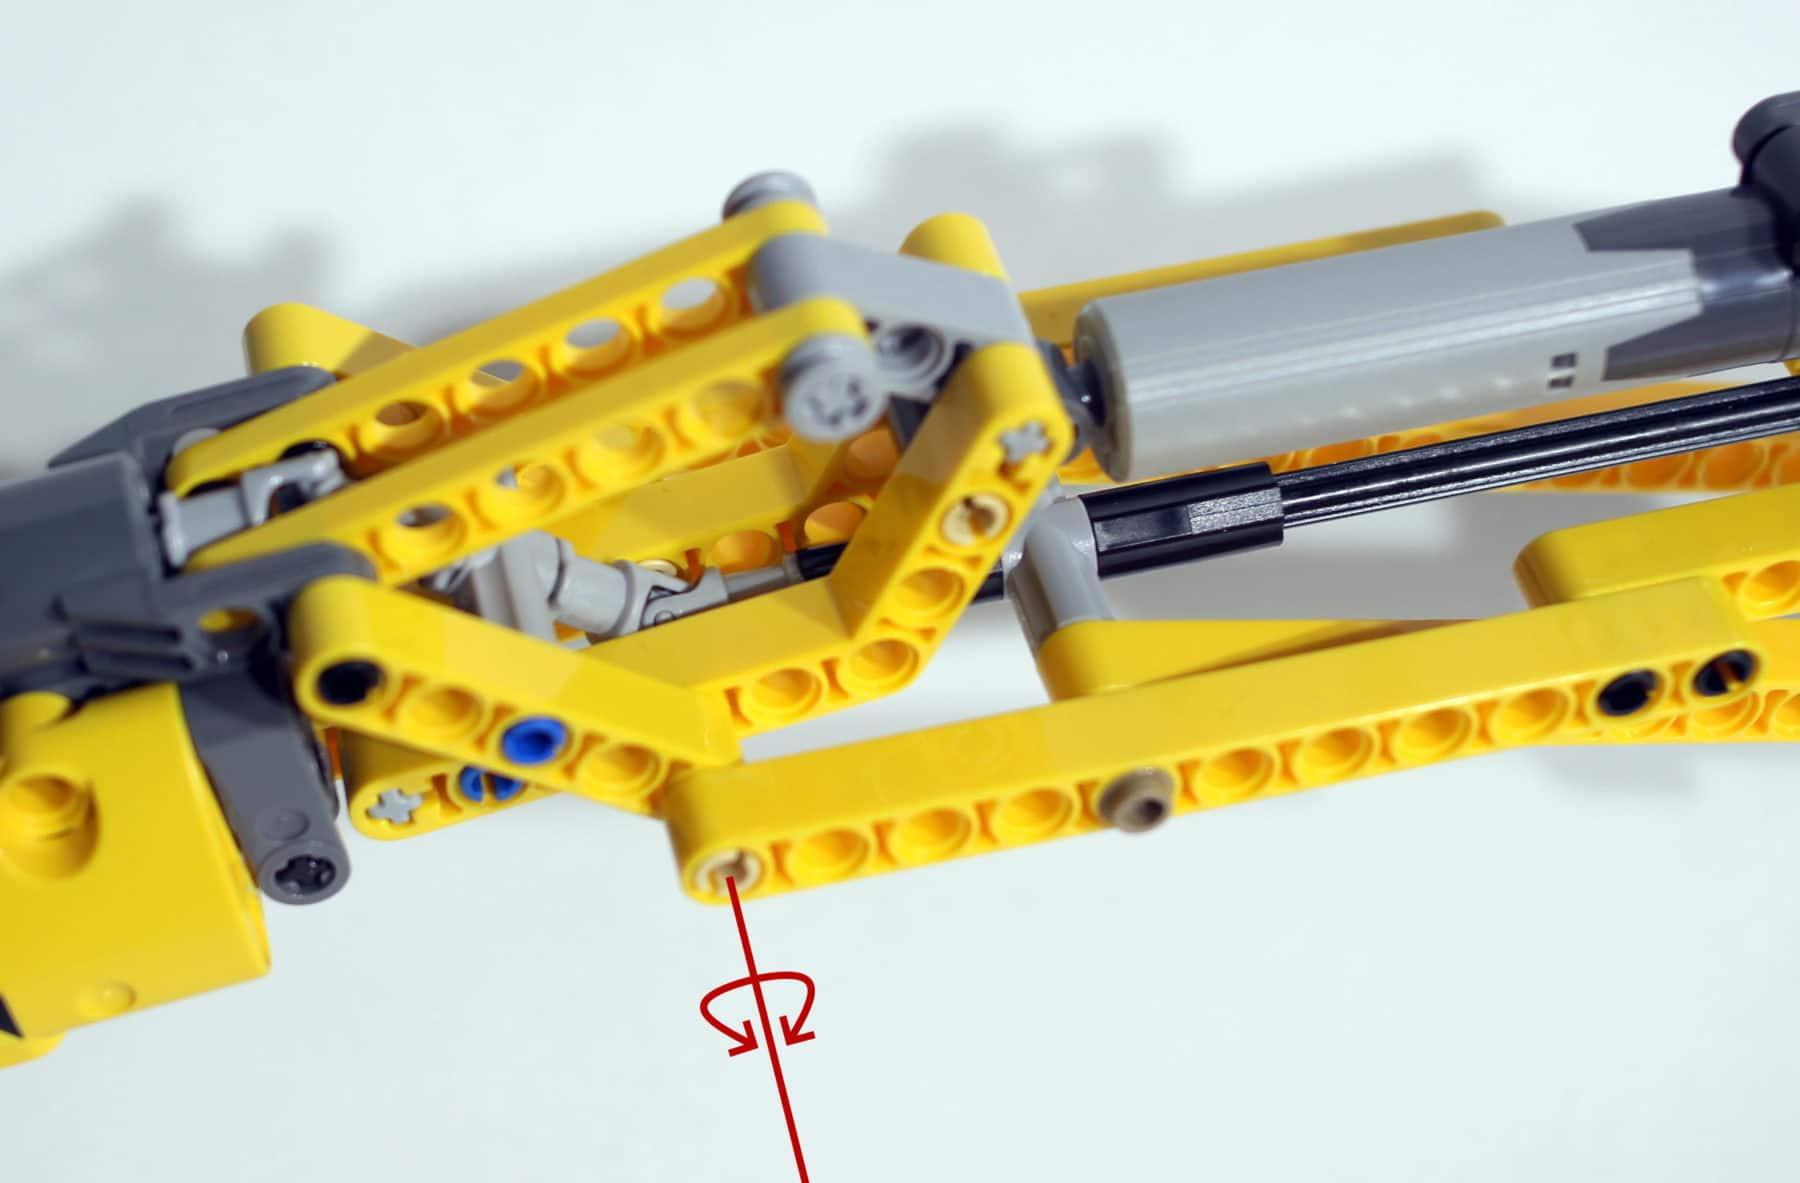 LEGO Technik 8043: Kraftübertragung am Ausleger